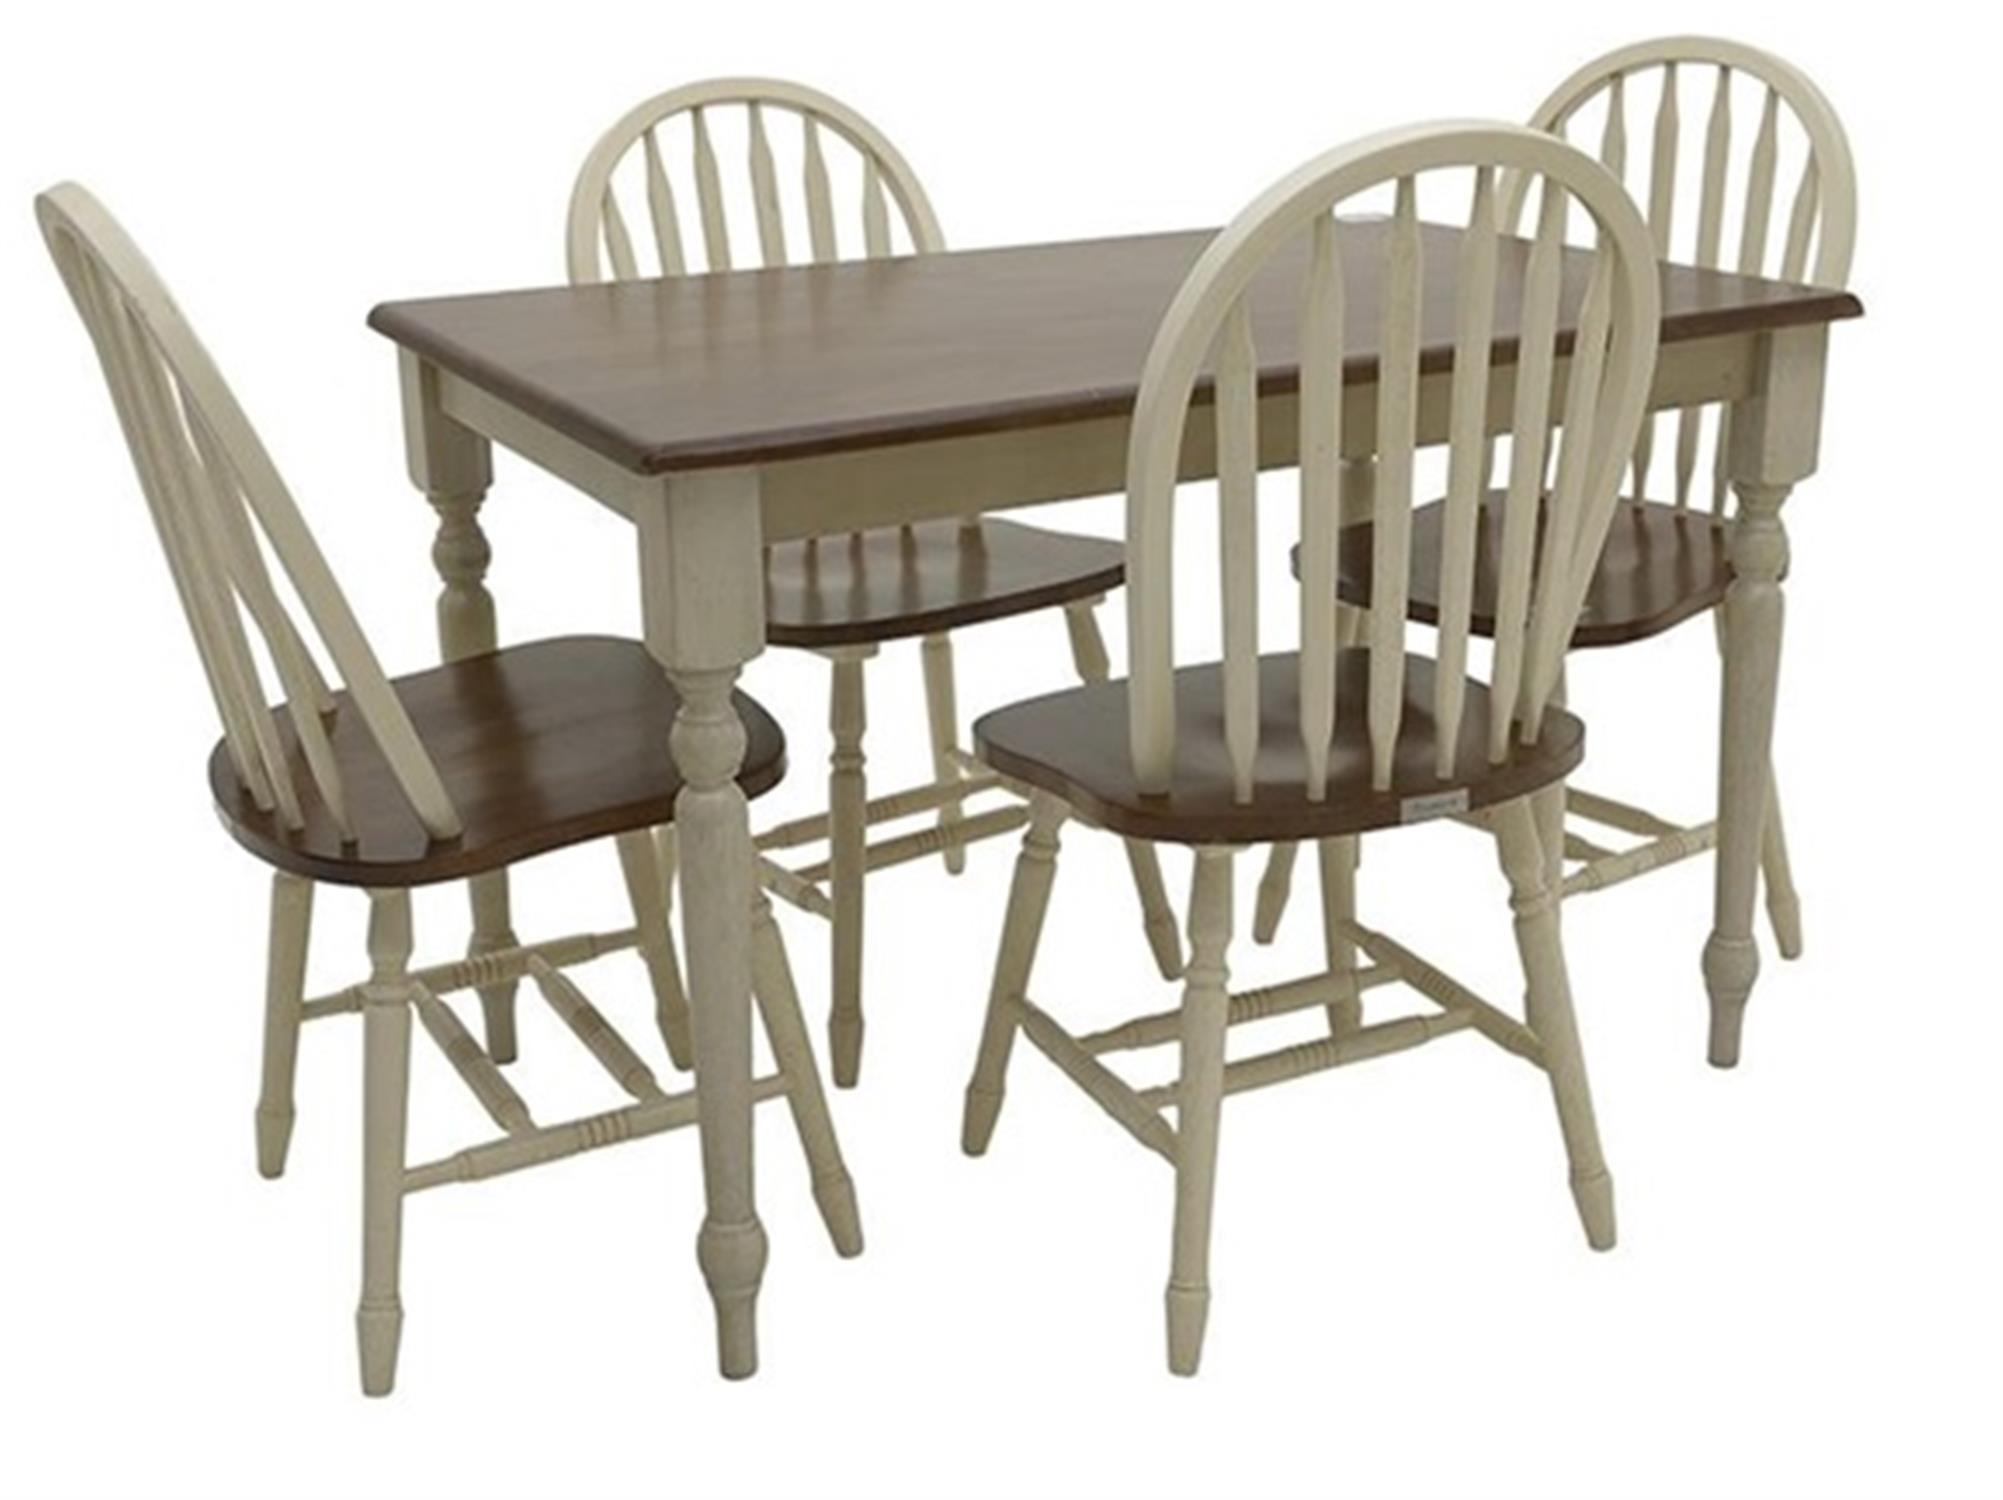 S/5 Τραπέζι Oslo με 4 καρέκλες Boston ξύλινο decape κρεμ/καφέ 114x74x75cm Home Plus 02.01.0078-1